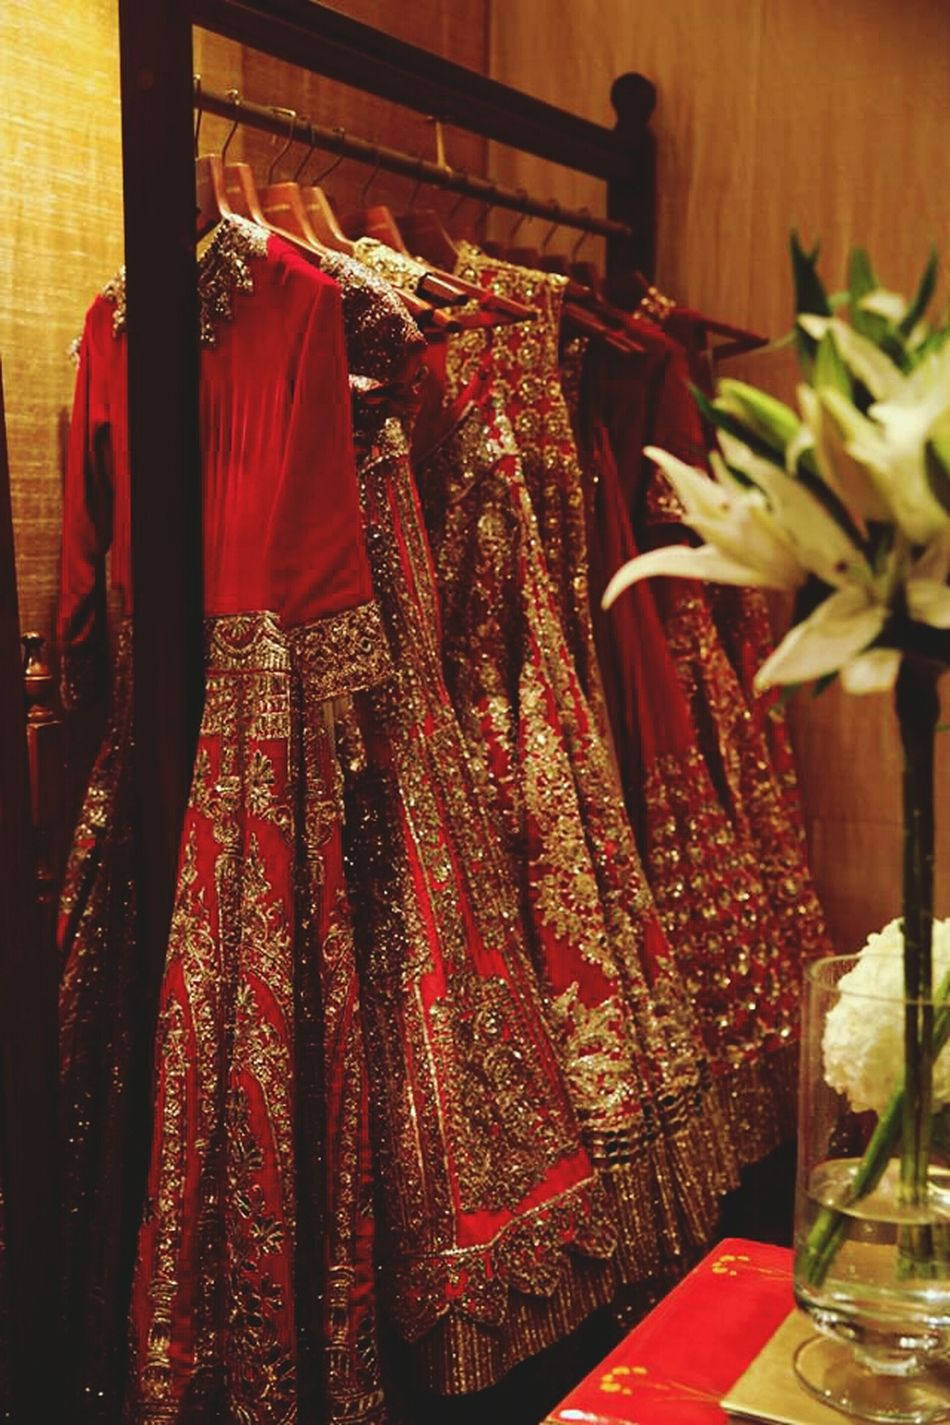 SisterLovee ♥ Manish Malhotra Wedding Dress Fashion&love&beauty thank u manish malhotra!